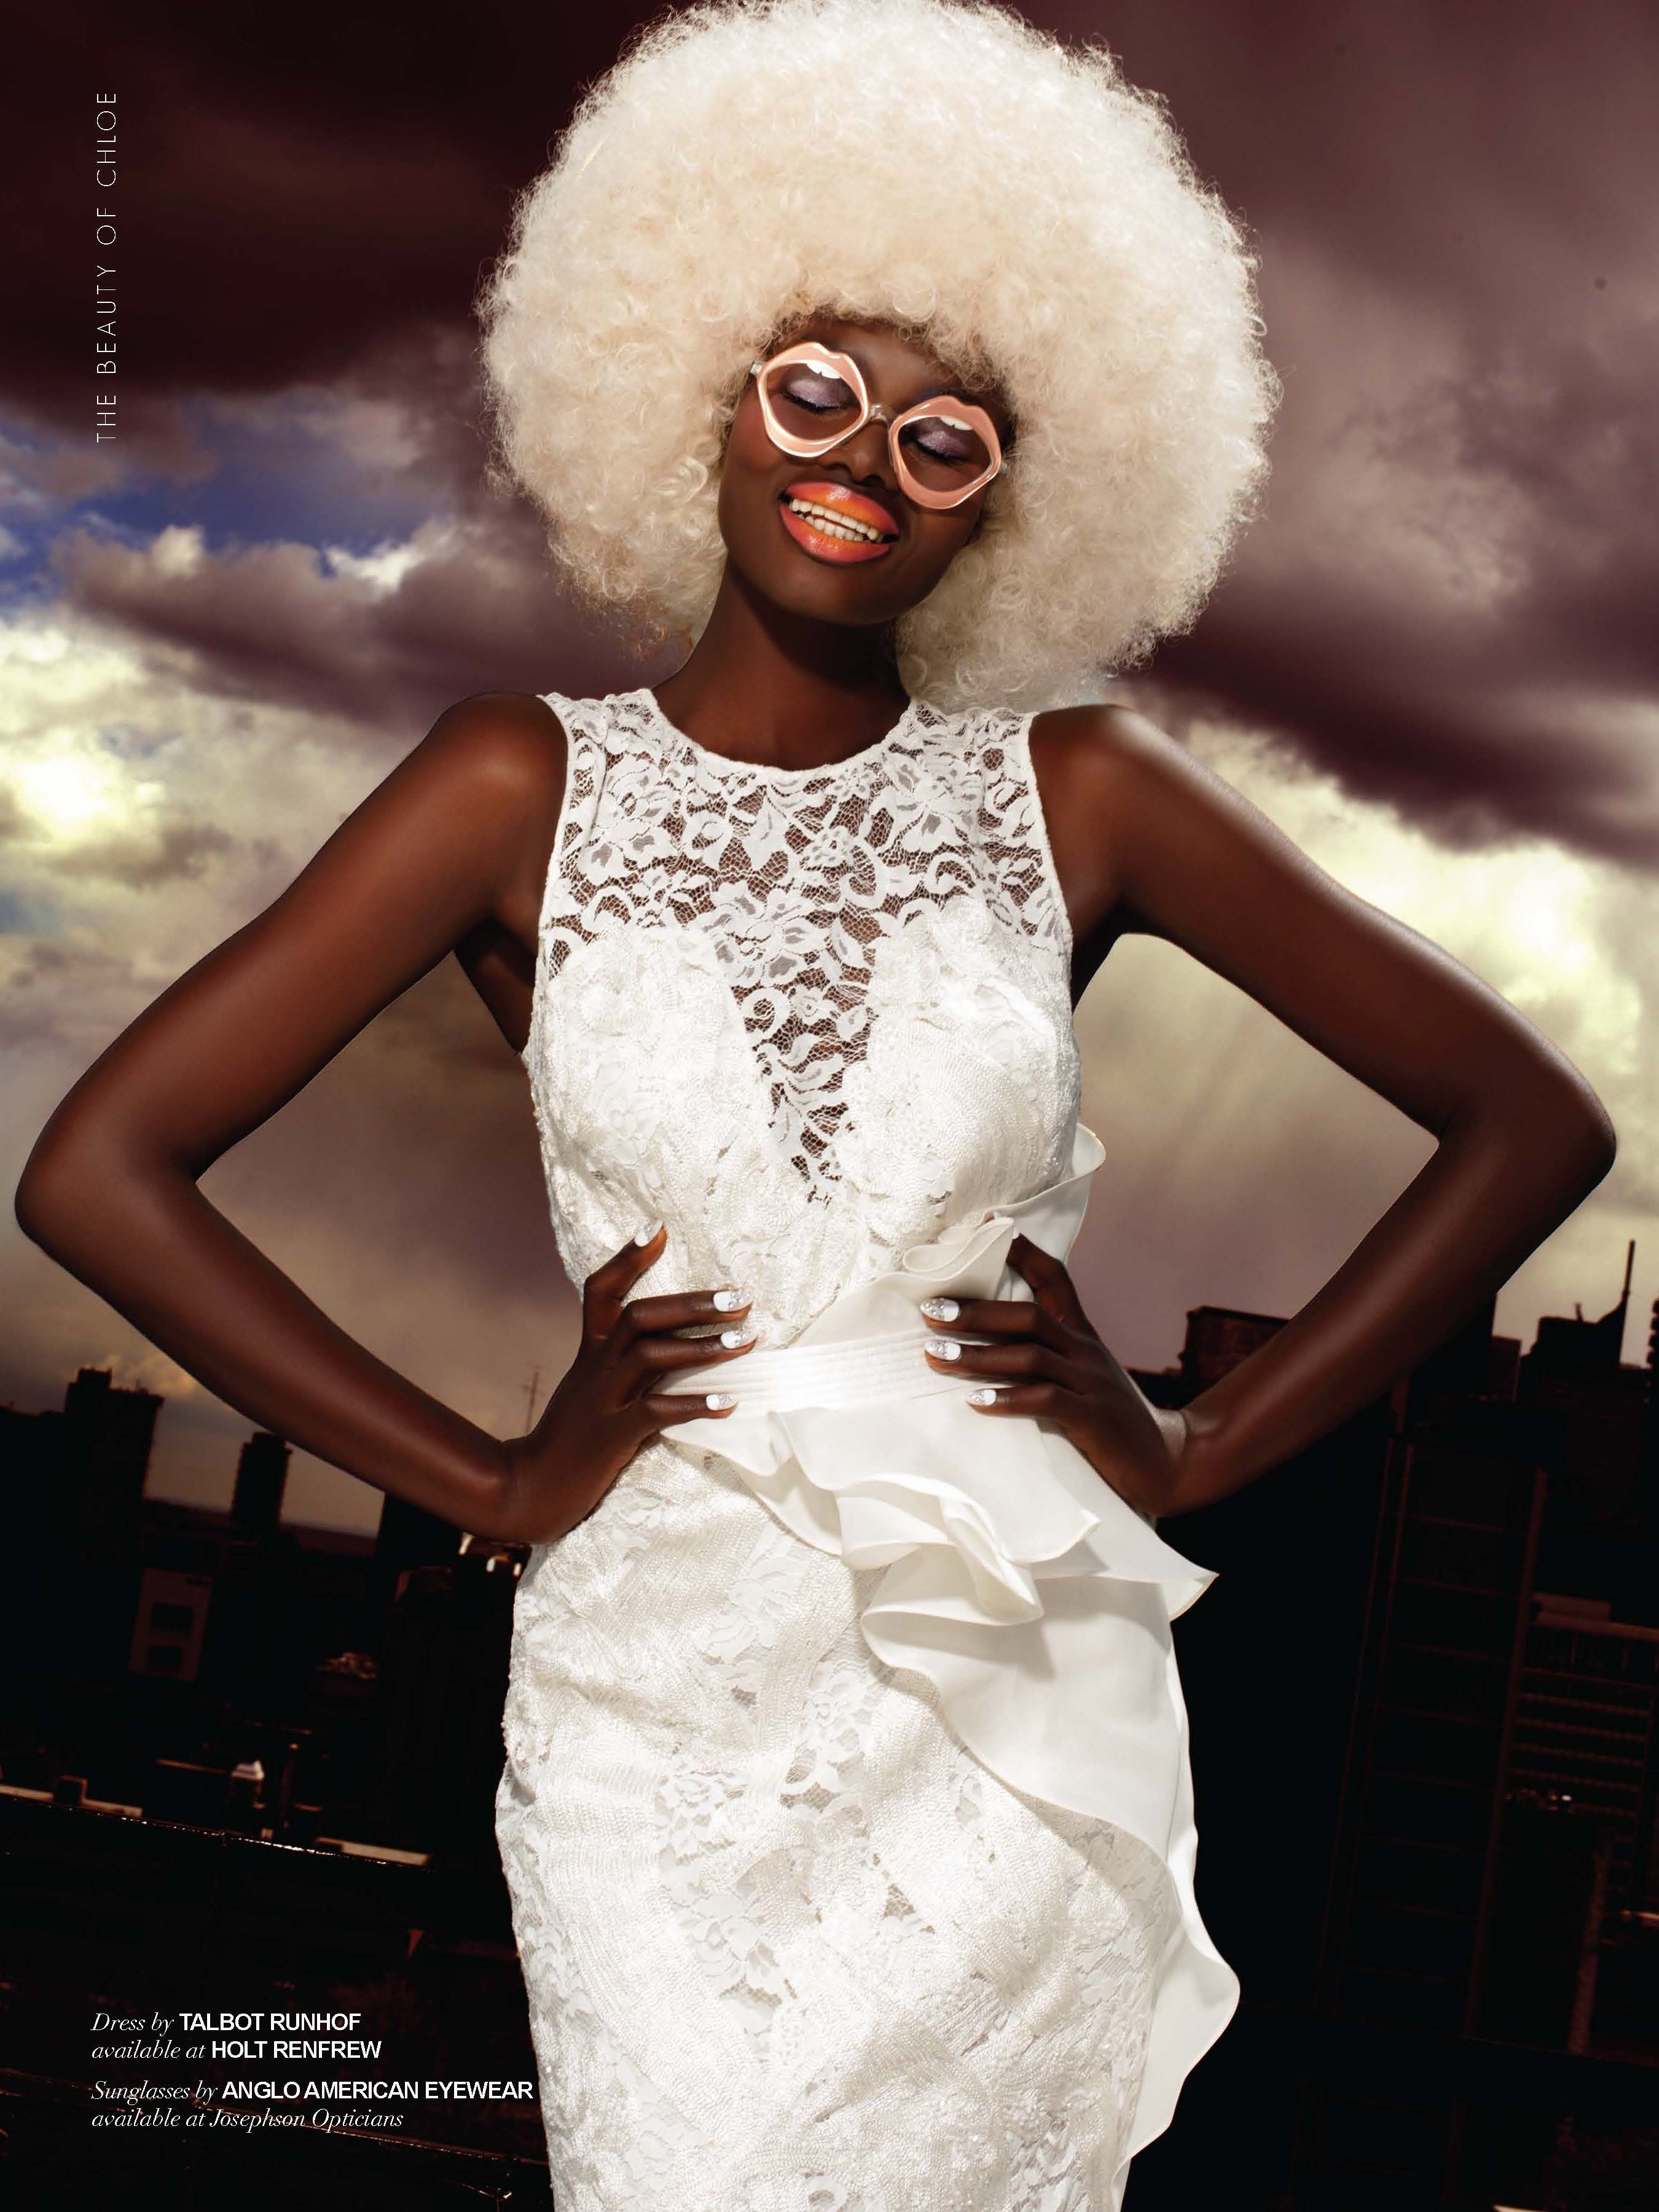 #SUMMER ISSUE #chloemagazine #laugh #white #dress #look #style #amarsanagendunova #matthewlyn #fashion